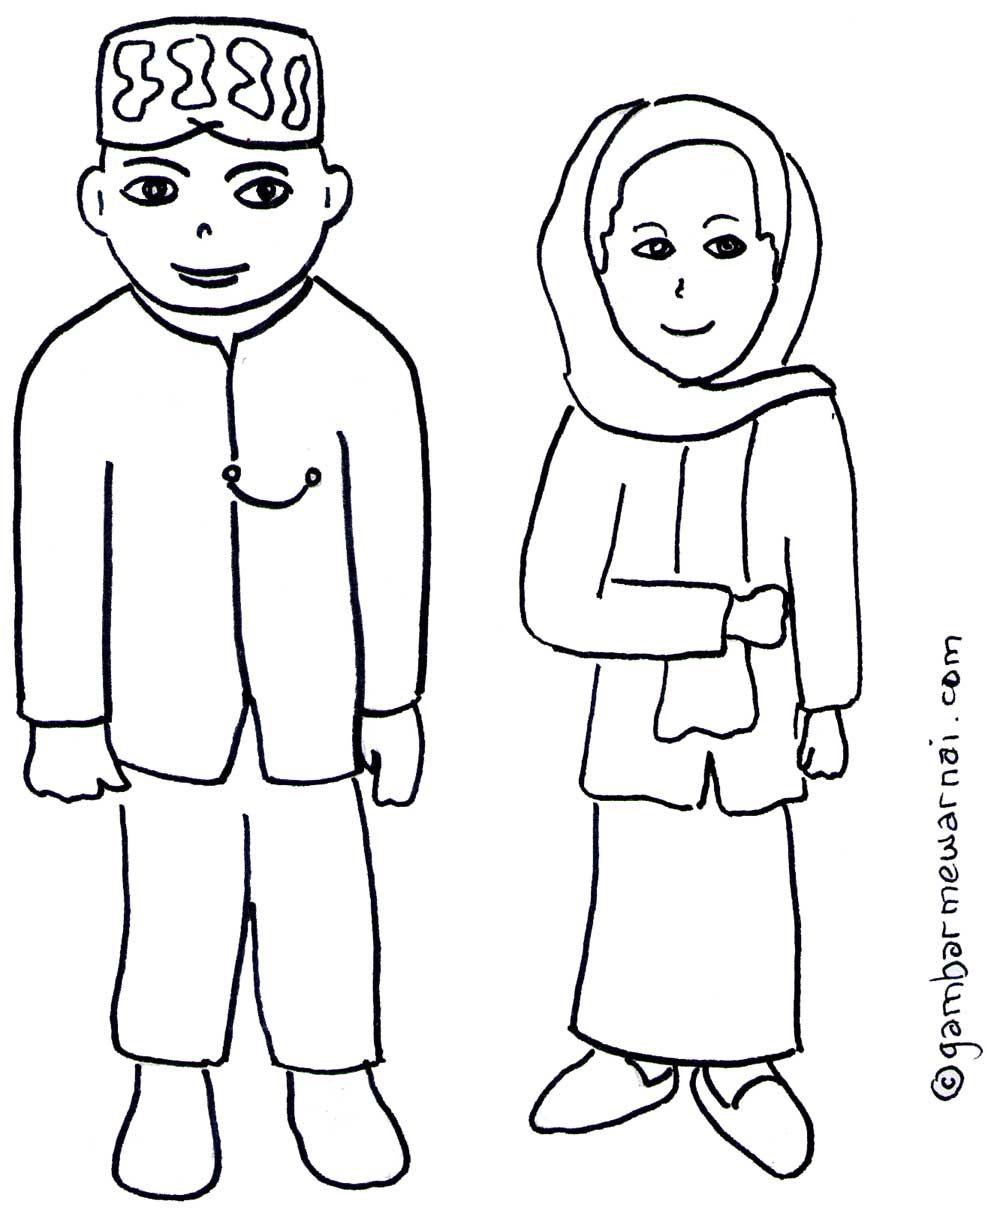 Contoh Gambar Pakaian-pakaian Adat